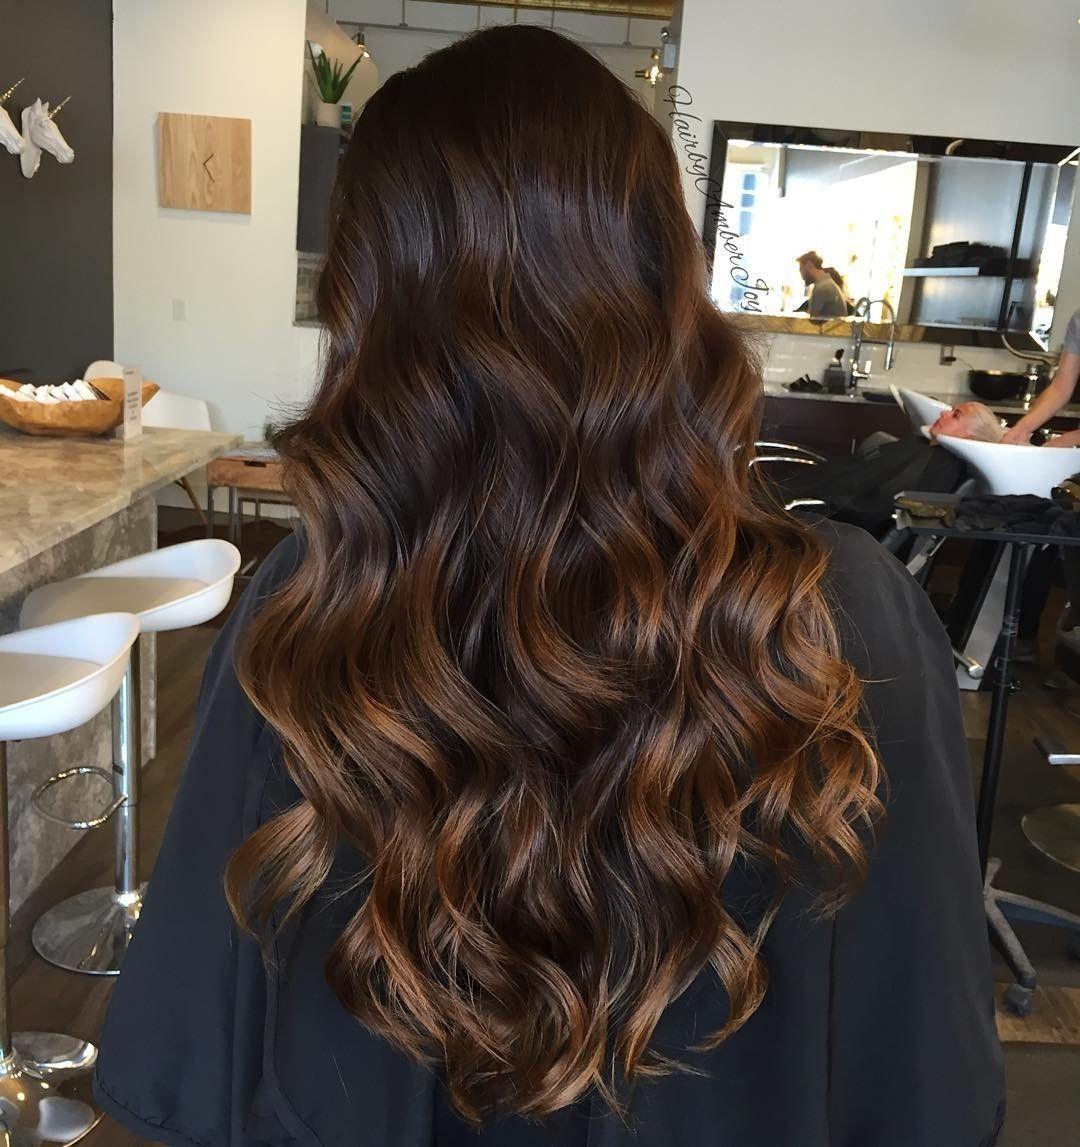 Caramel Lowlights For Dark Brown Hair Tag Caramel Highlights And Balayage Hair Hair Color Balayage Brown Hair With Caramel Highlights